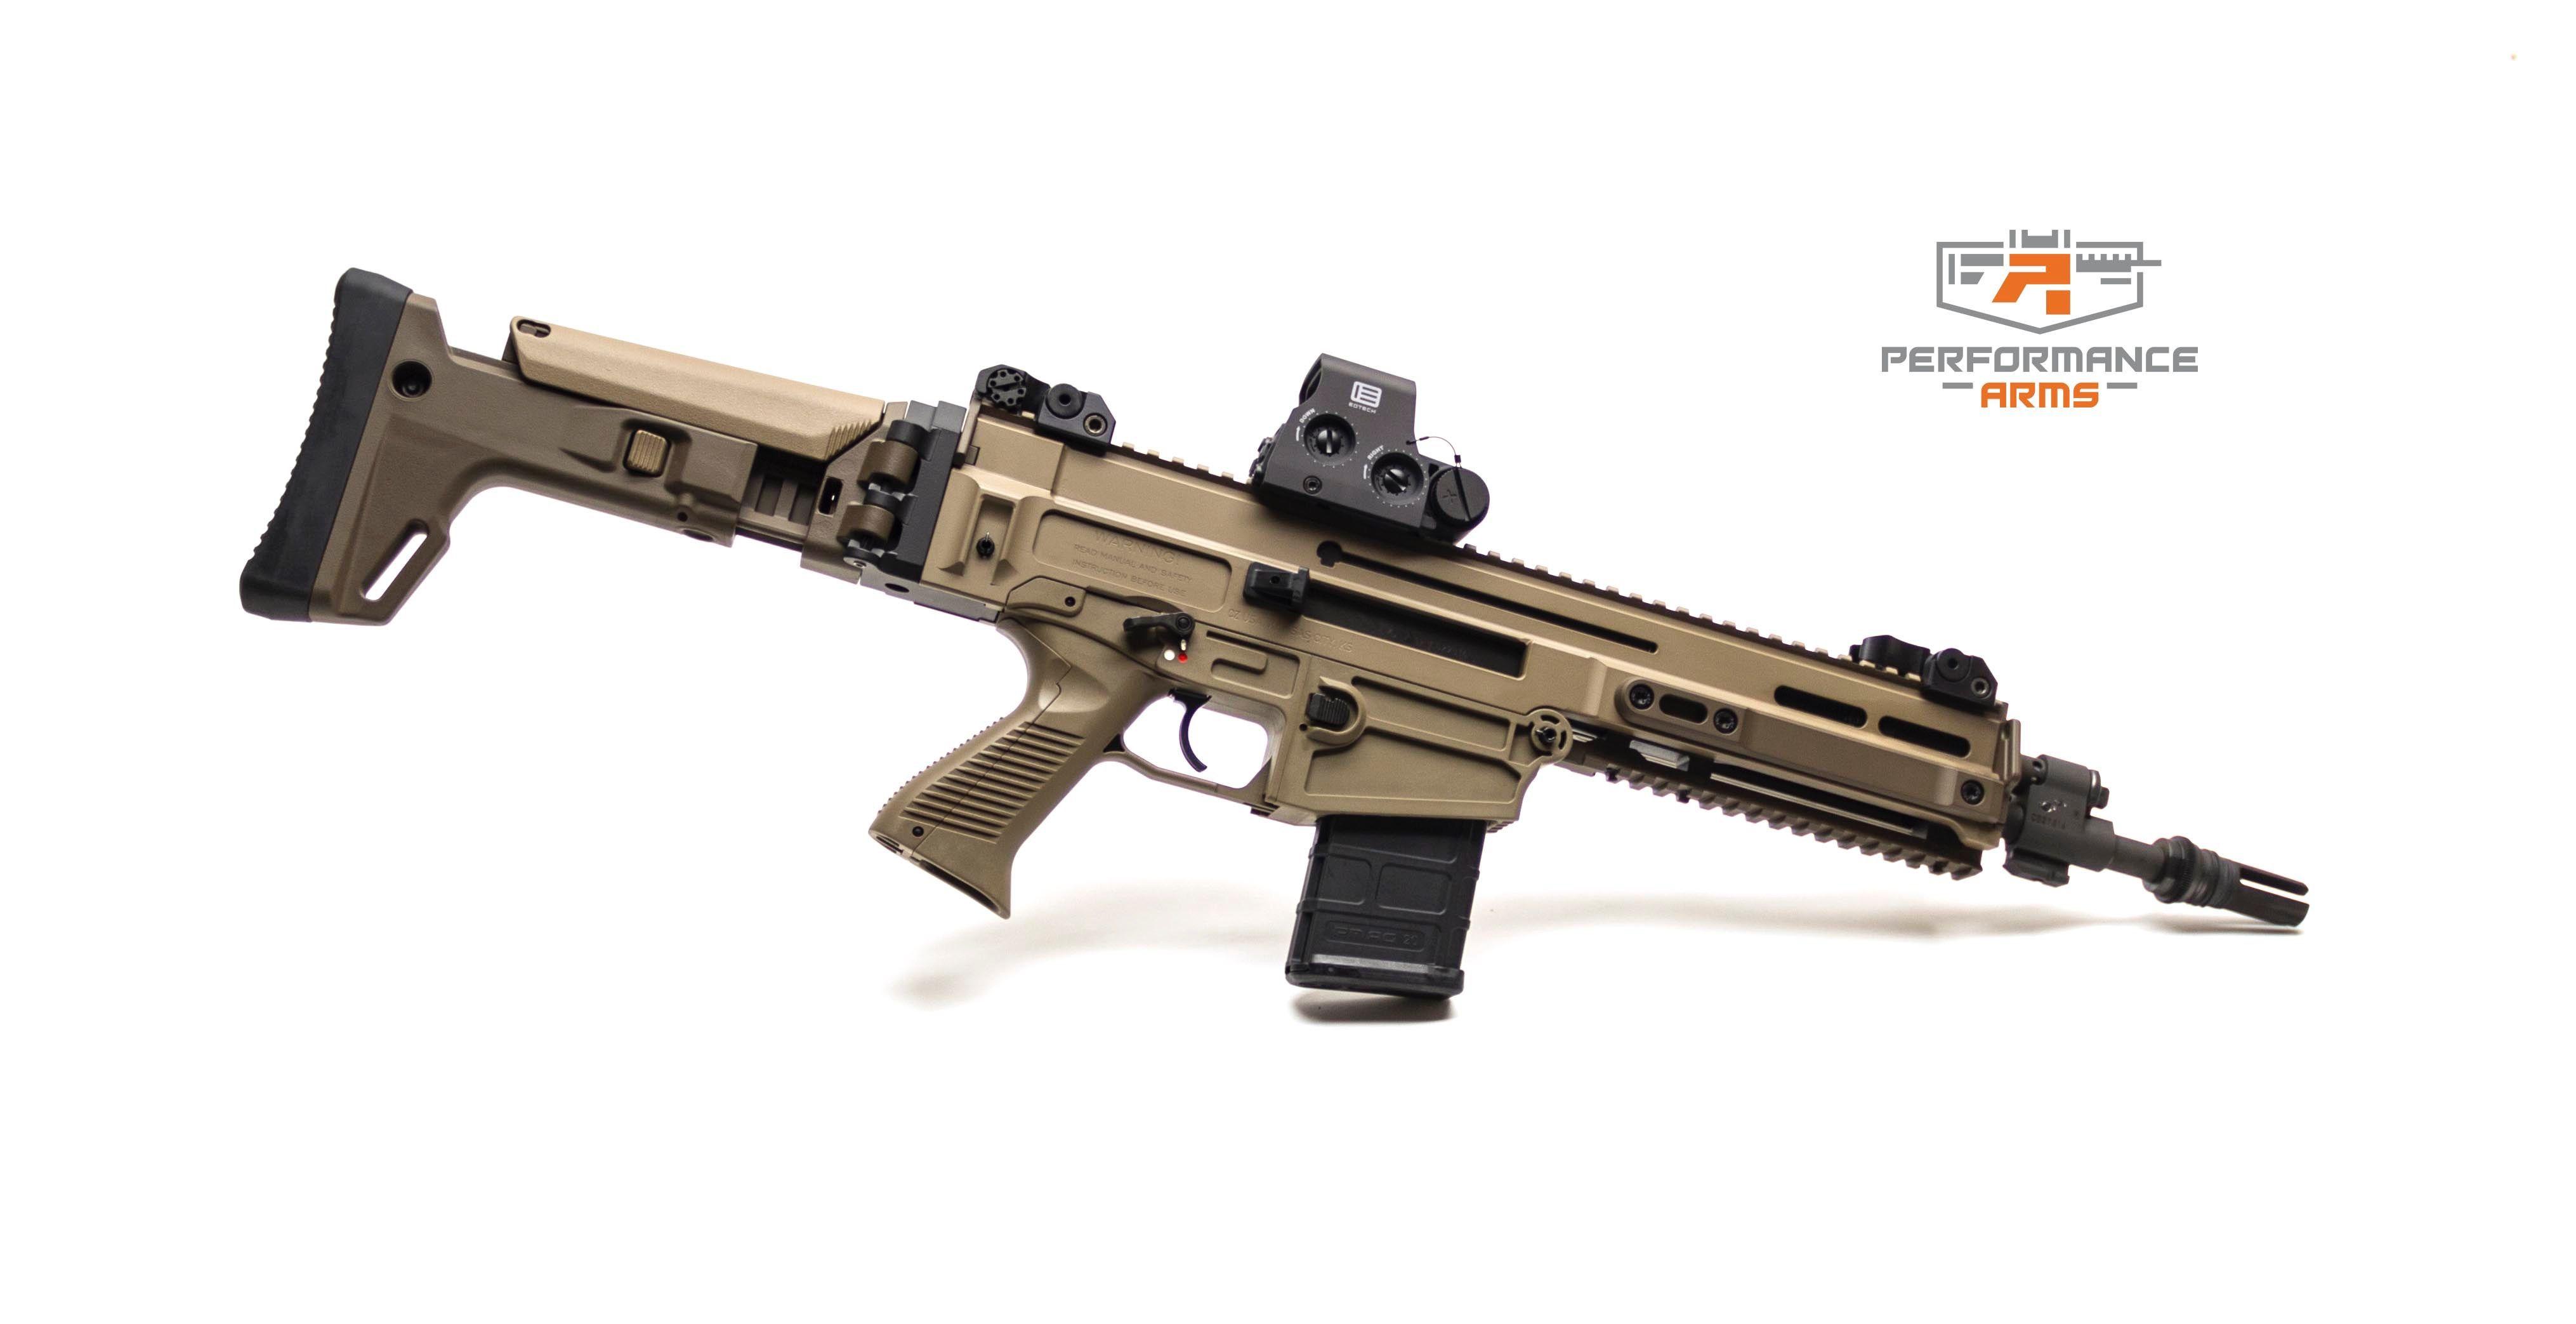 Performance Arms Custom Cz Bren With Sandline Tactical Folding